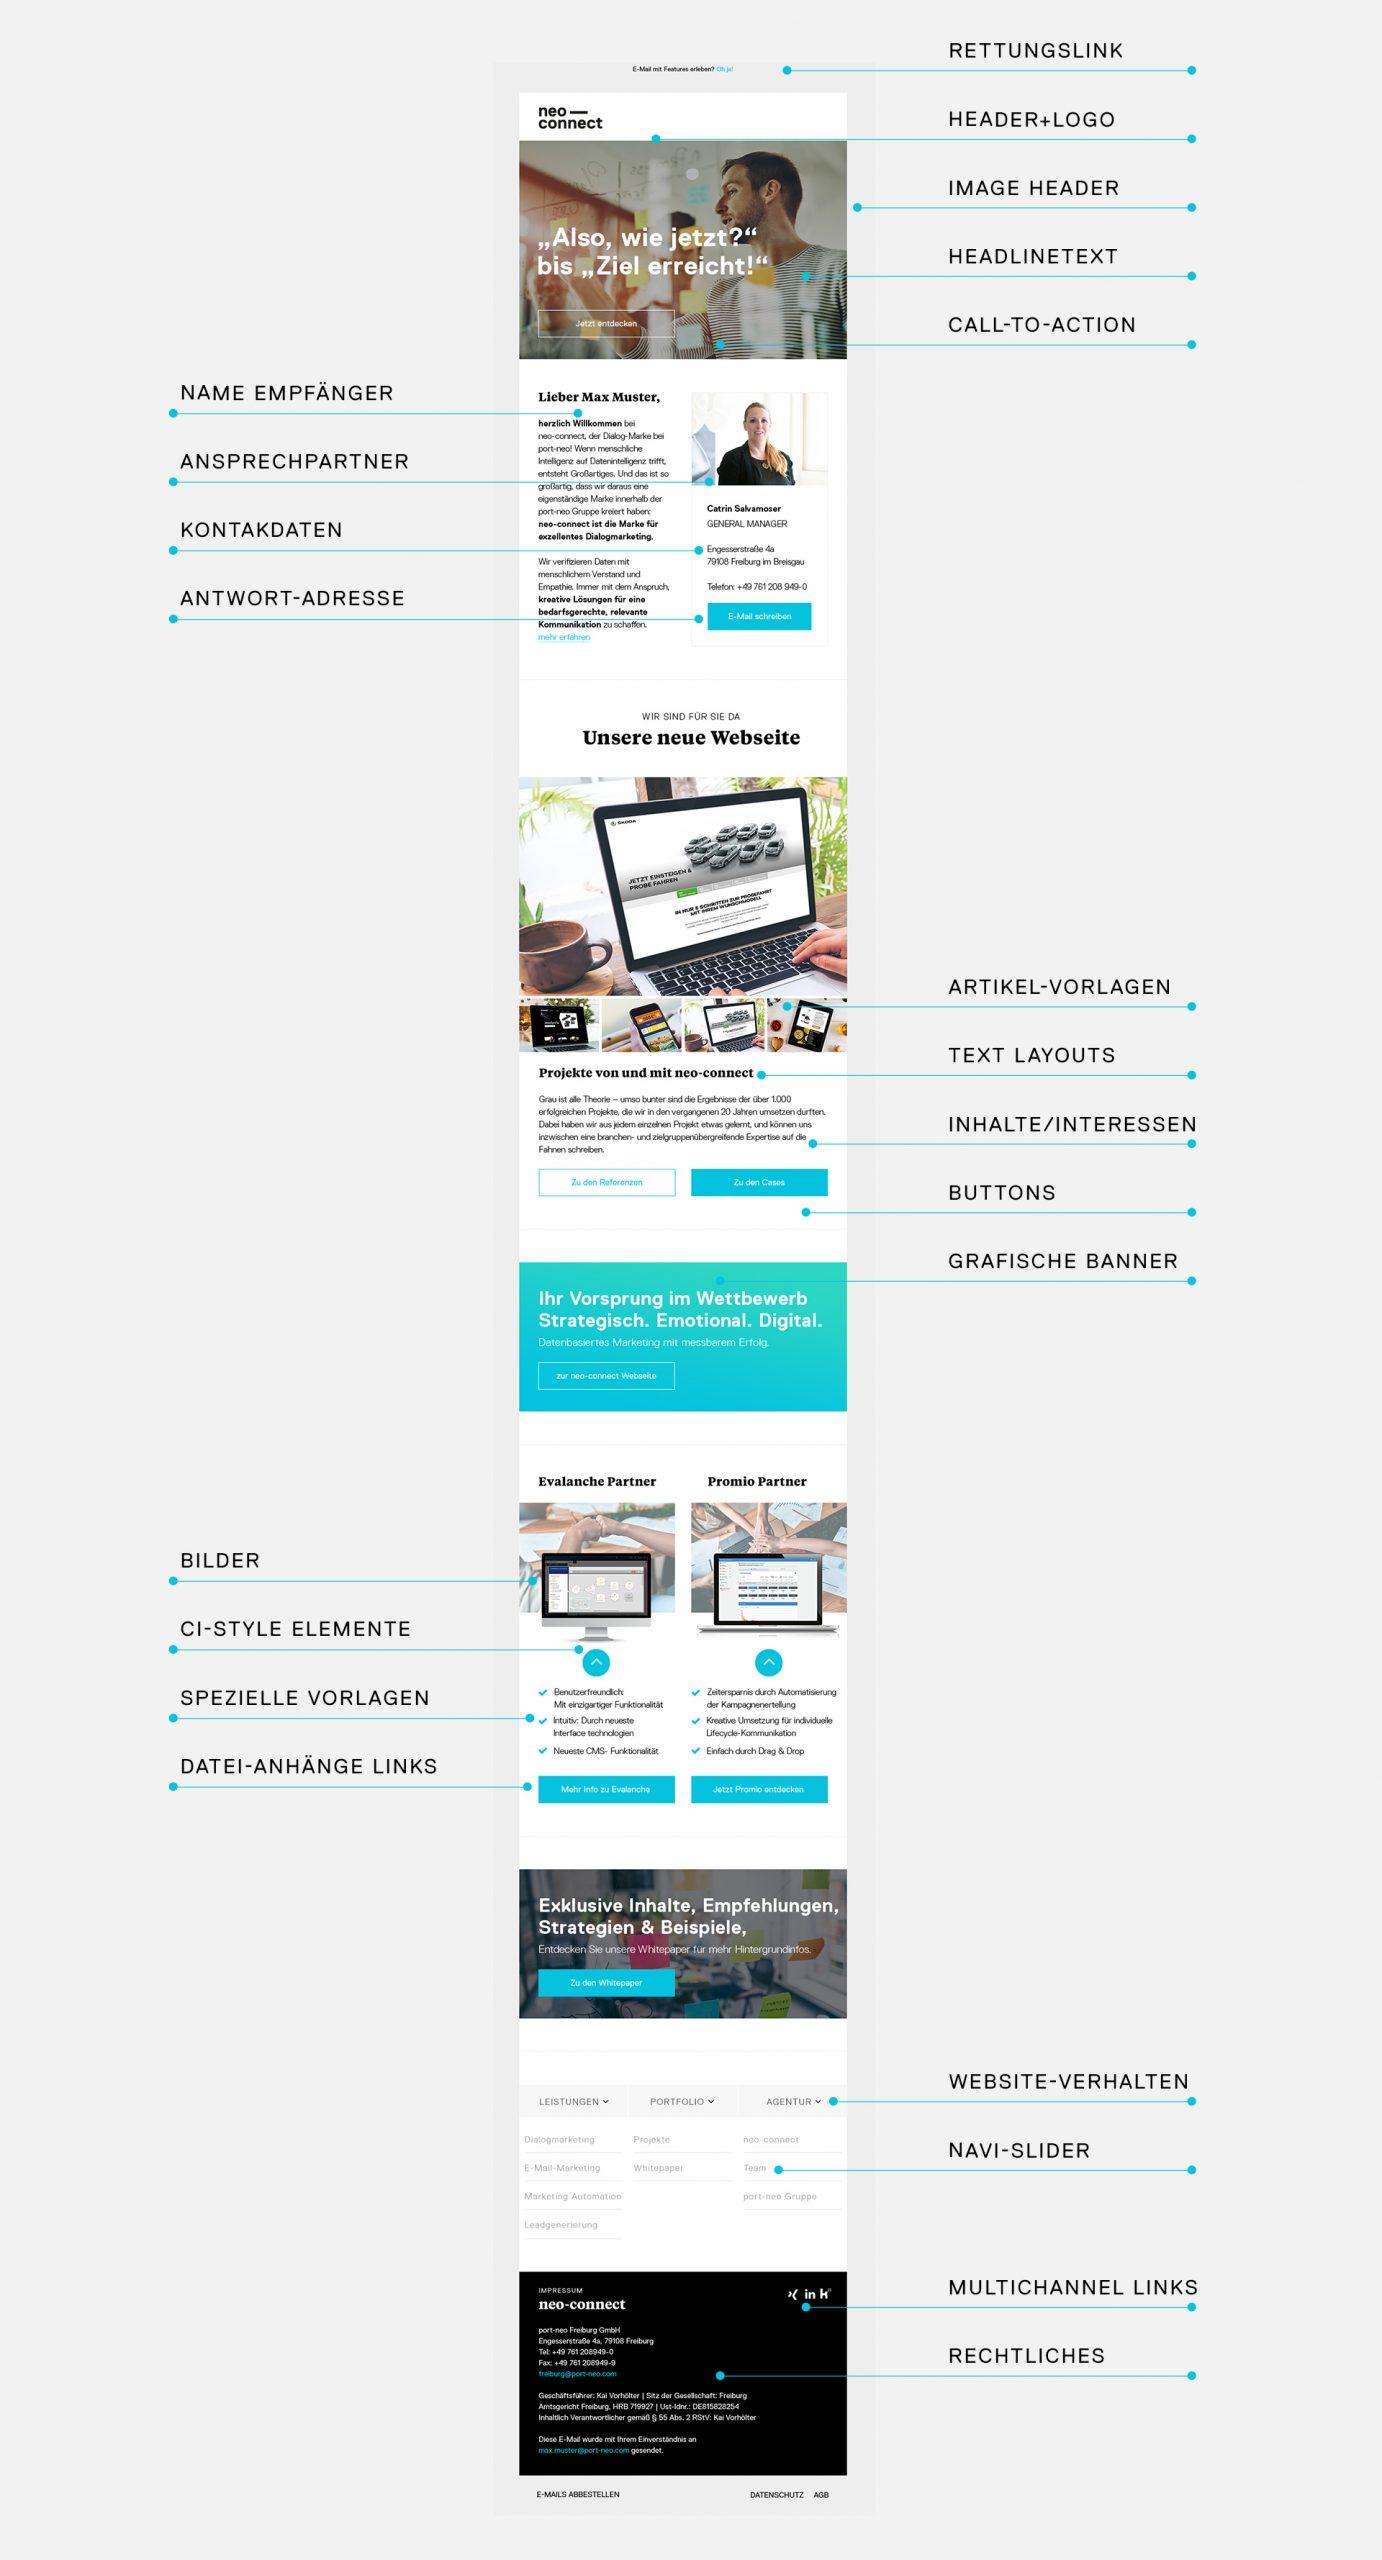 email-marketing-personalisierung